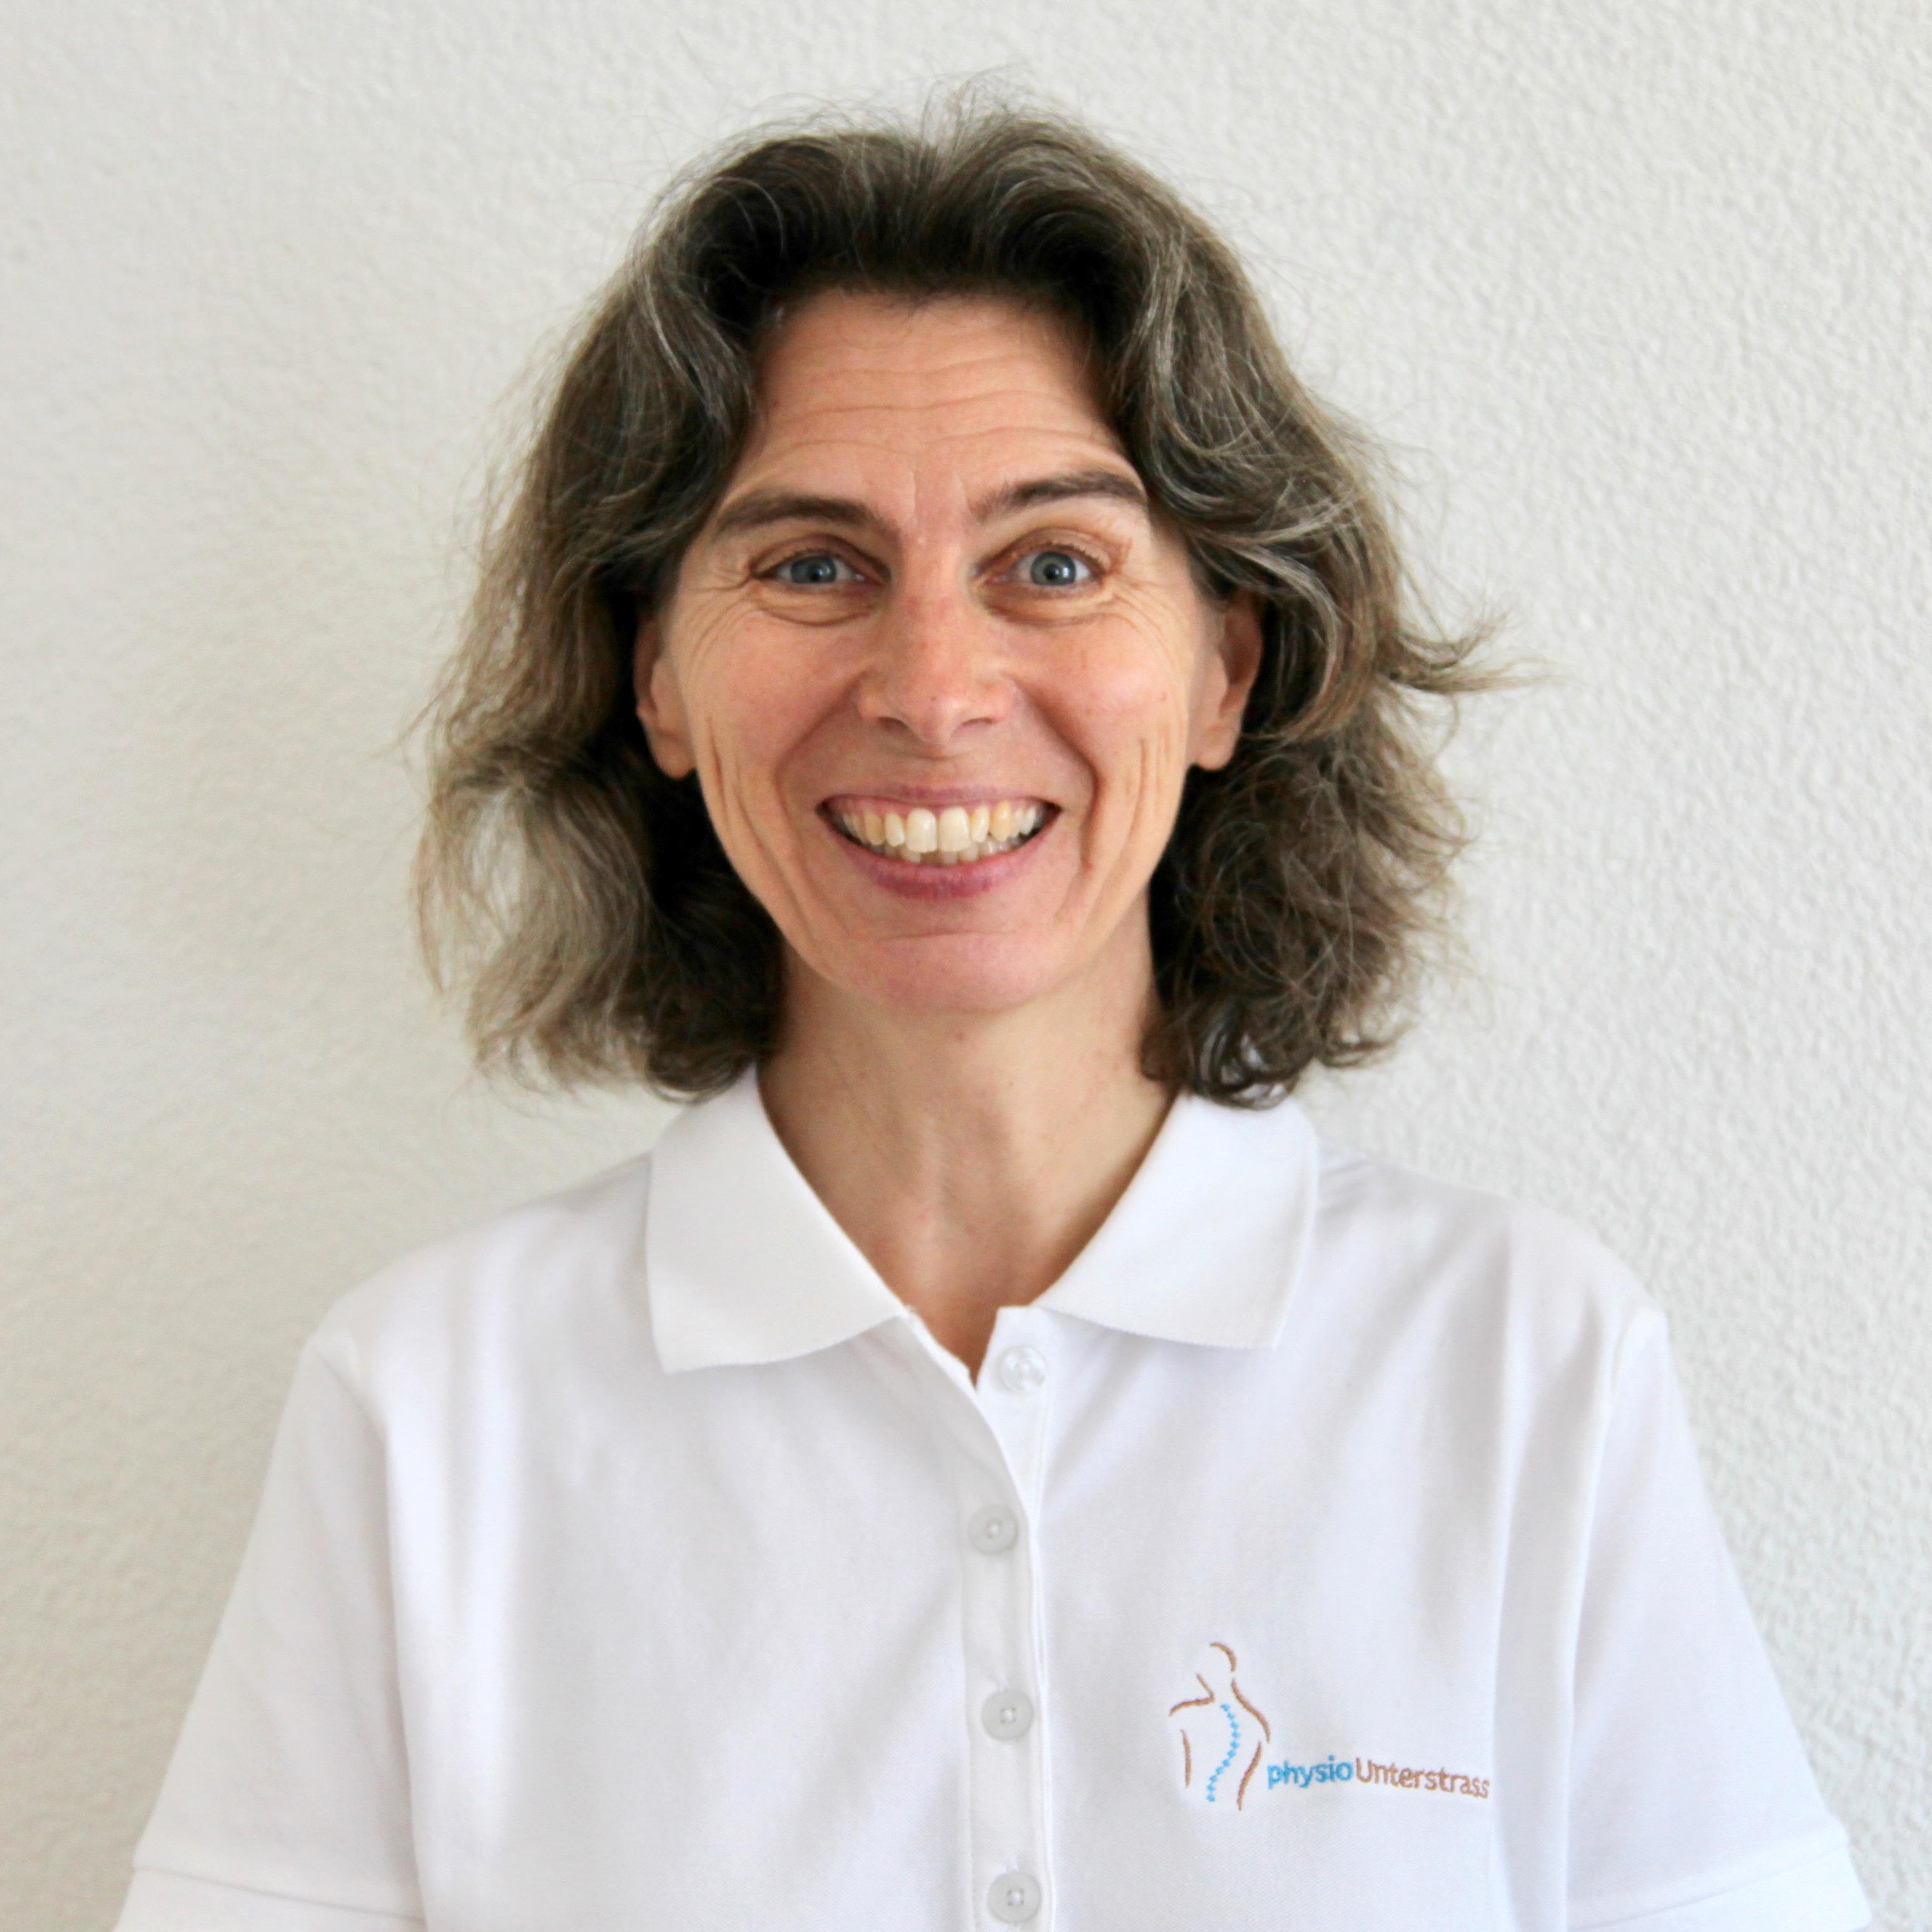 Cornelia Huber-Pfyffer, Physiotherapeutin Physioterapie Unterstrass Zürich, PhysioUnterstrass